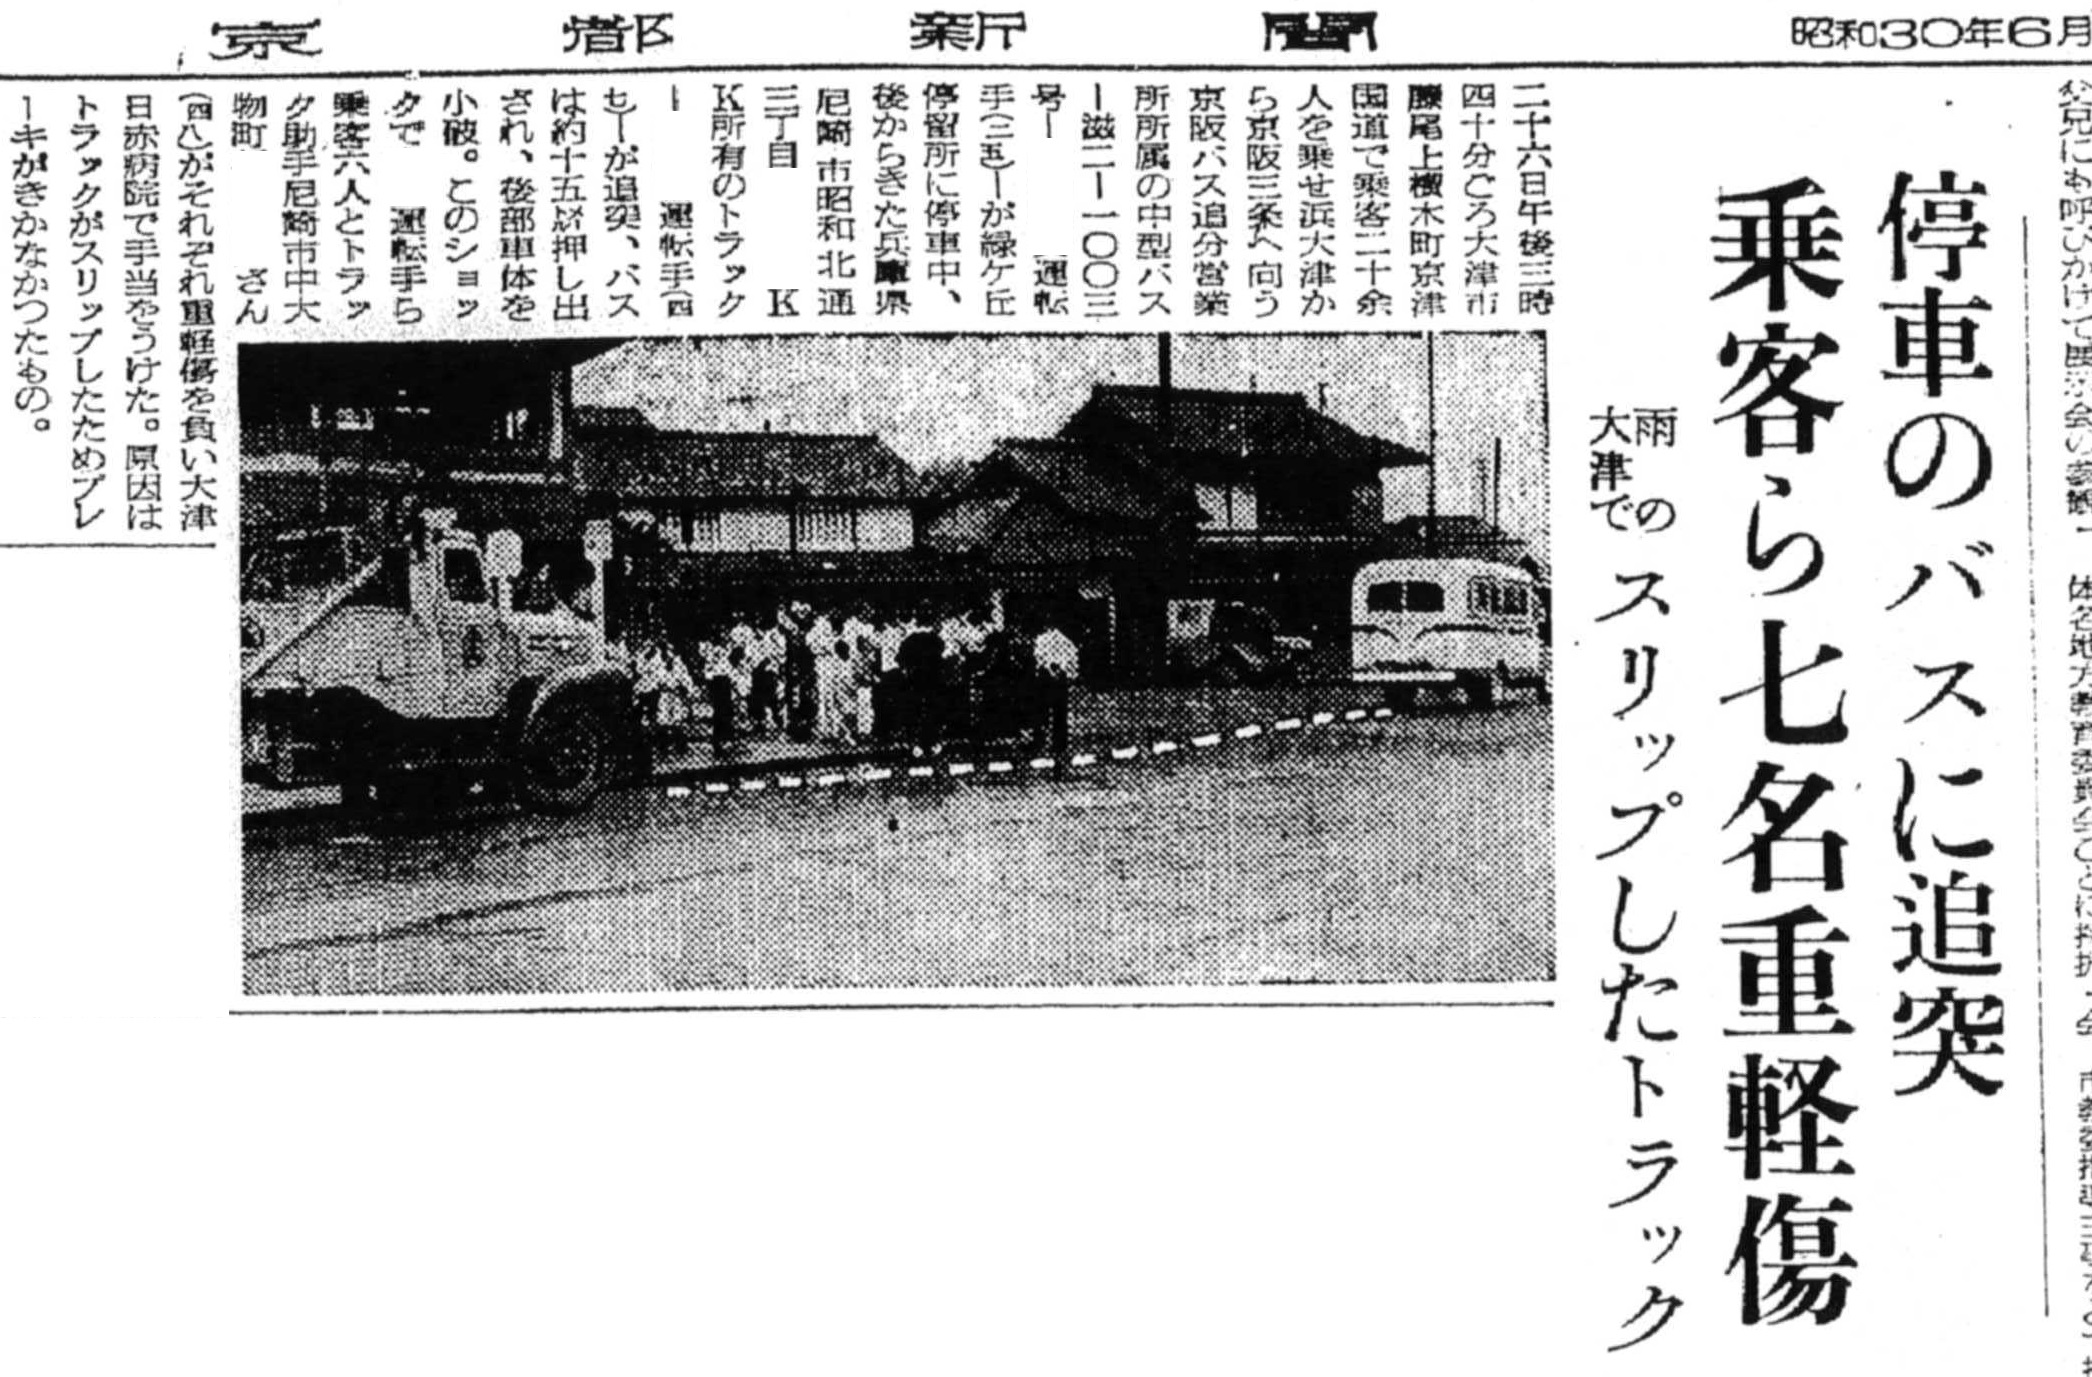 S30.6.27K 京津国道線緑が丘で事故b